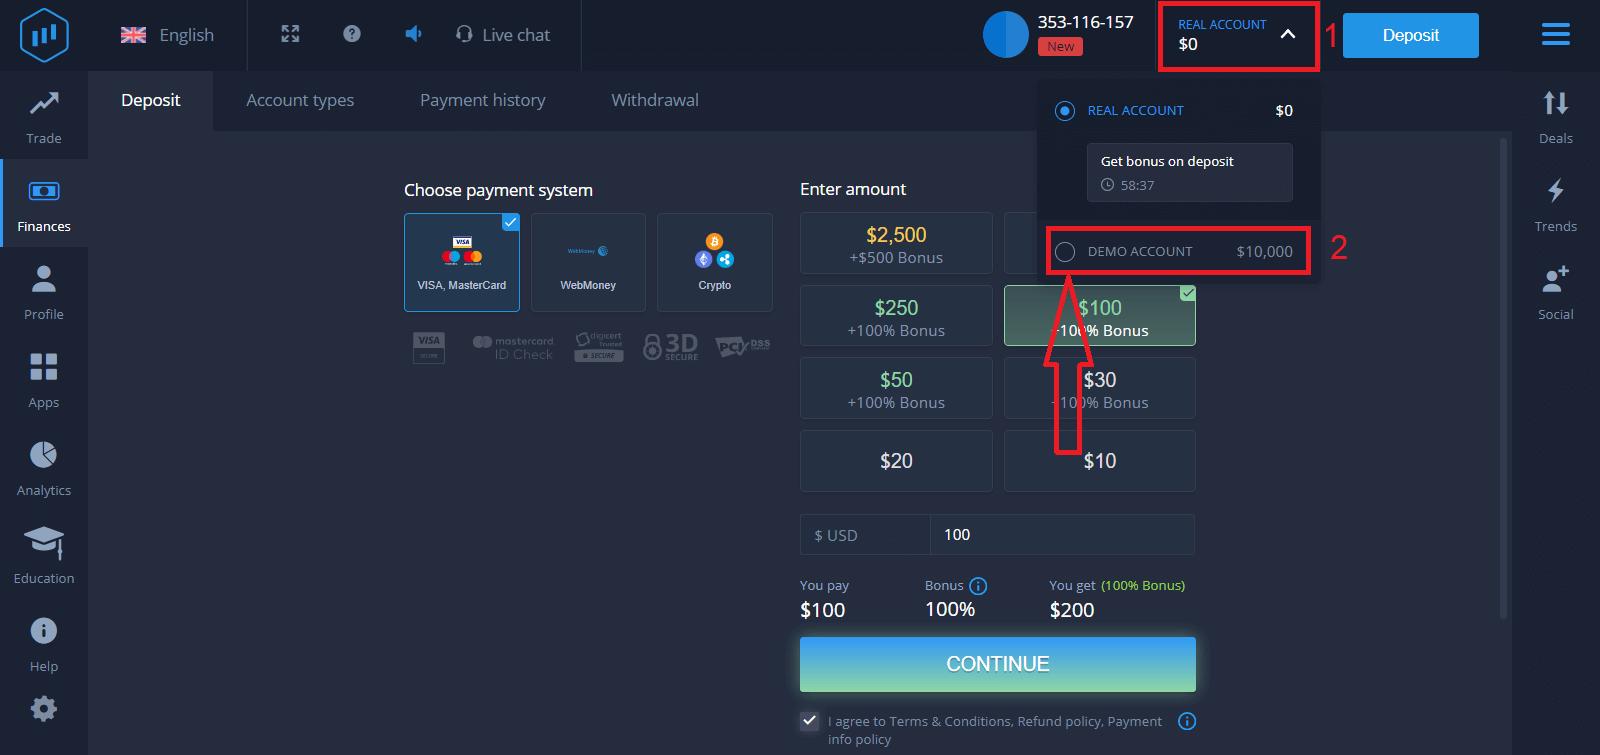 ExpertOptionでサインアップしてアカウントにログインする方法